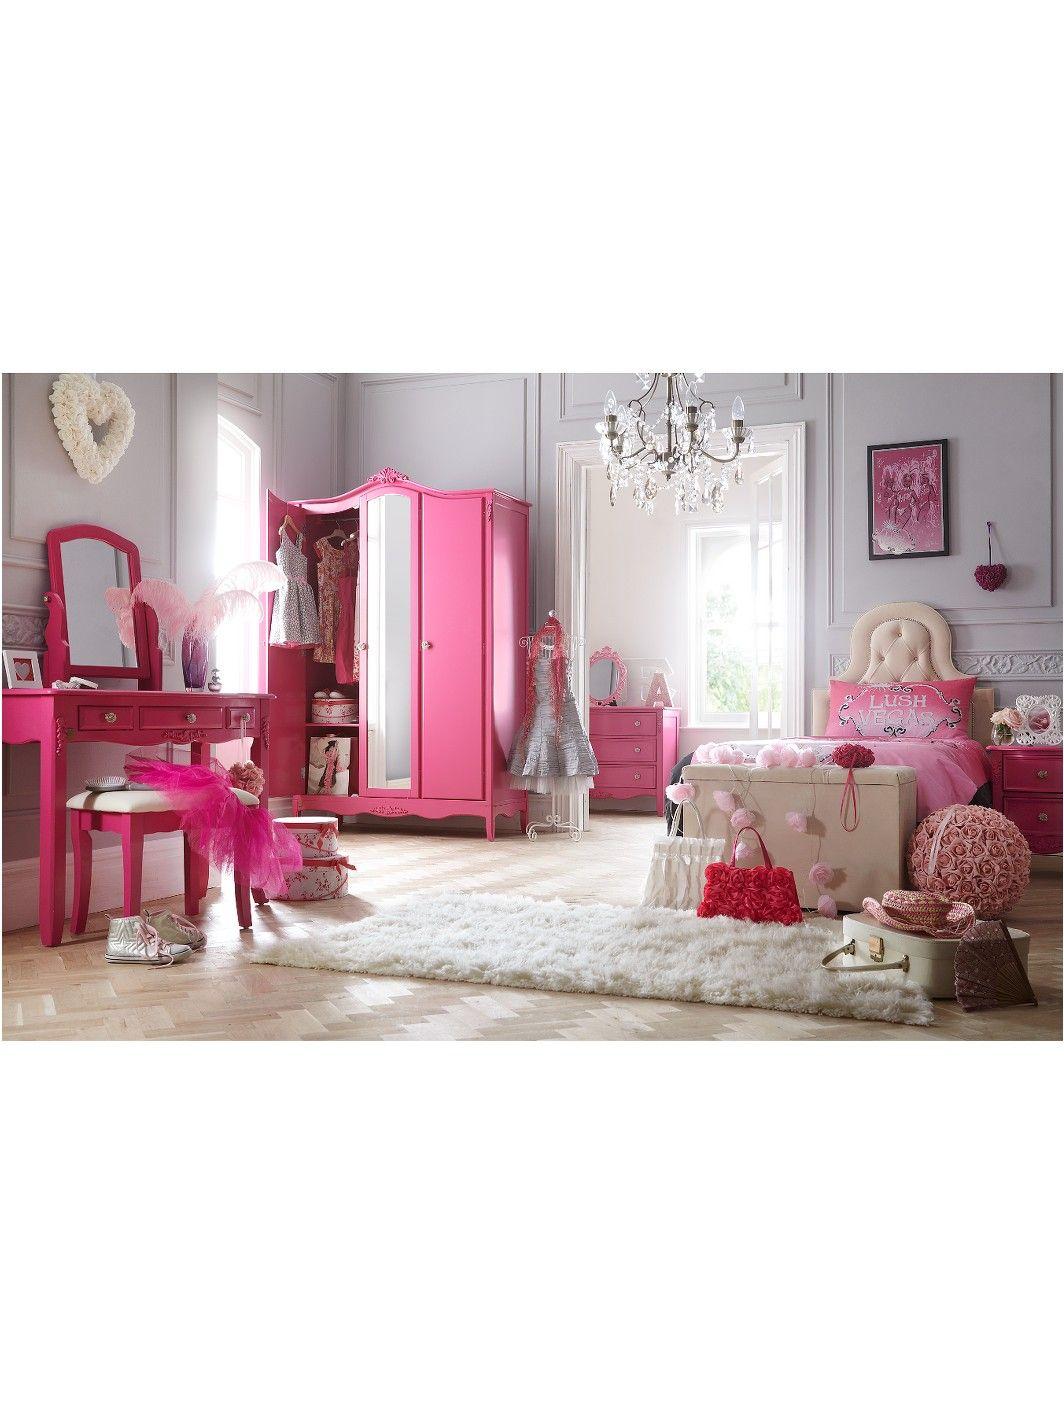 Princess Bedroom Furniture Uk Laurence Llewelyn Bowen Bonjour Boudoir 3 Door Kids Wardrobe